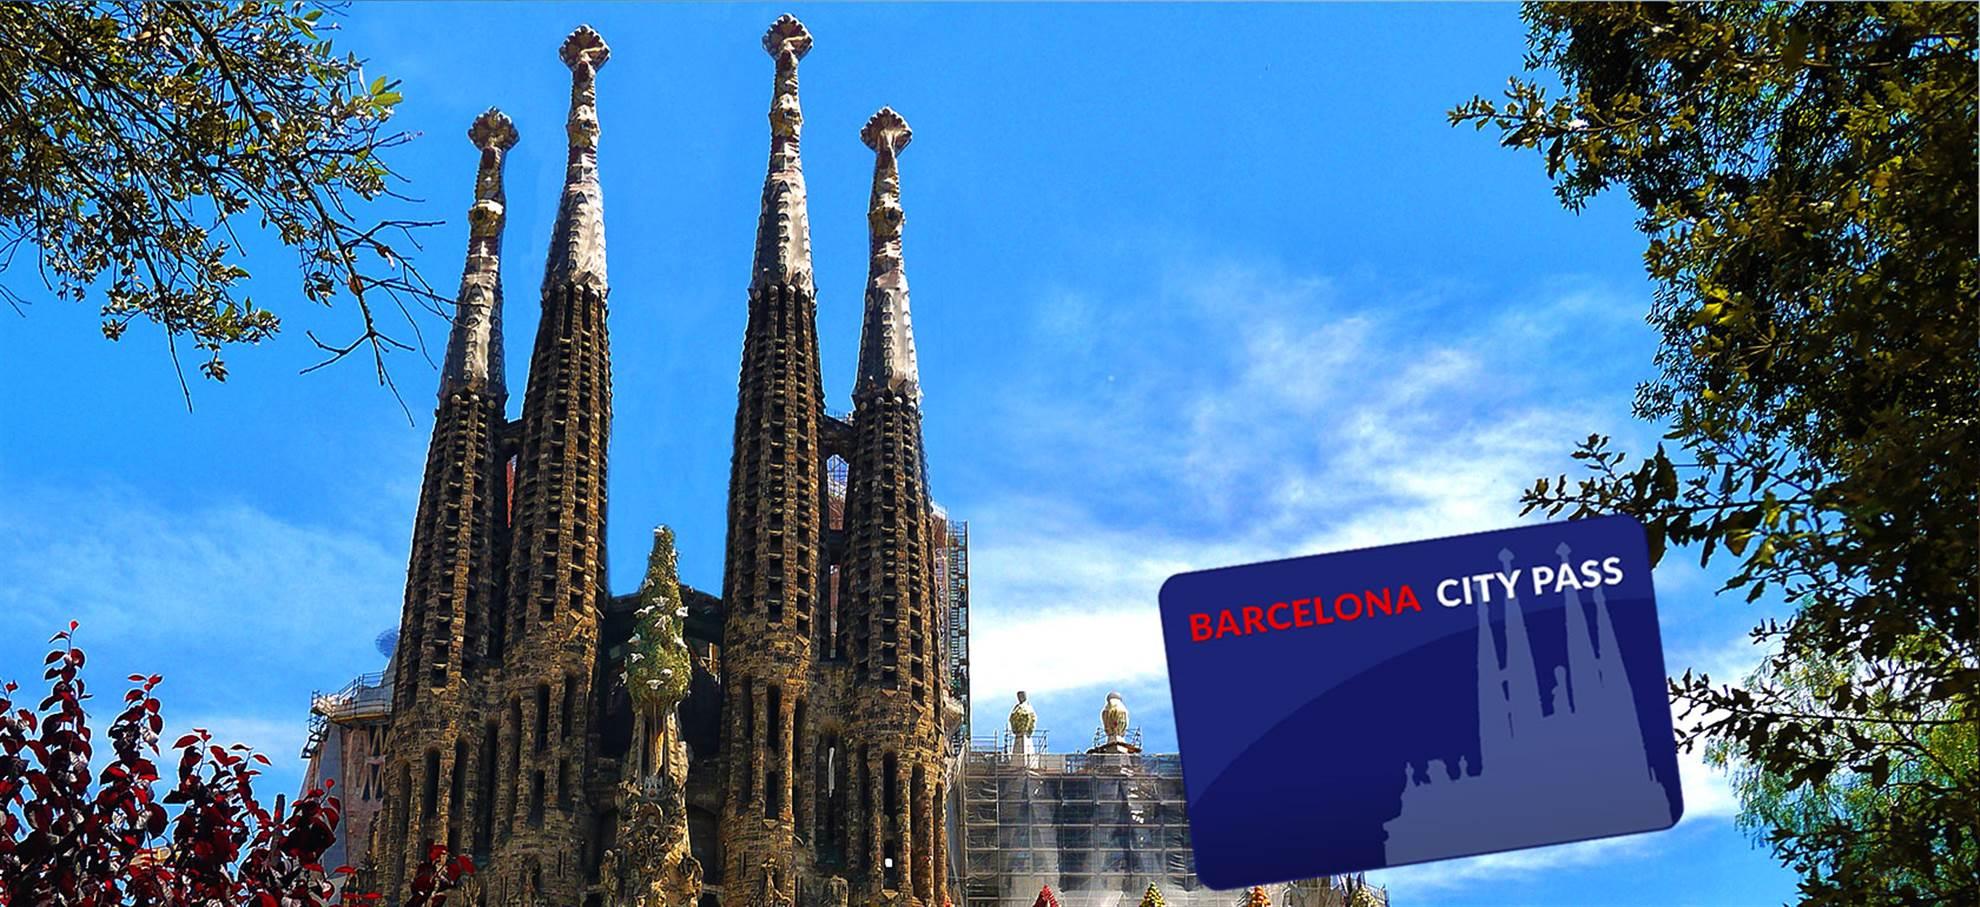 Barcelona City Pass (Incl. Sagrada Familia +  Audioguide, Park Guell)